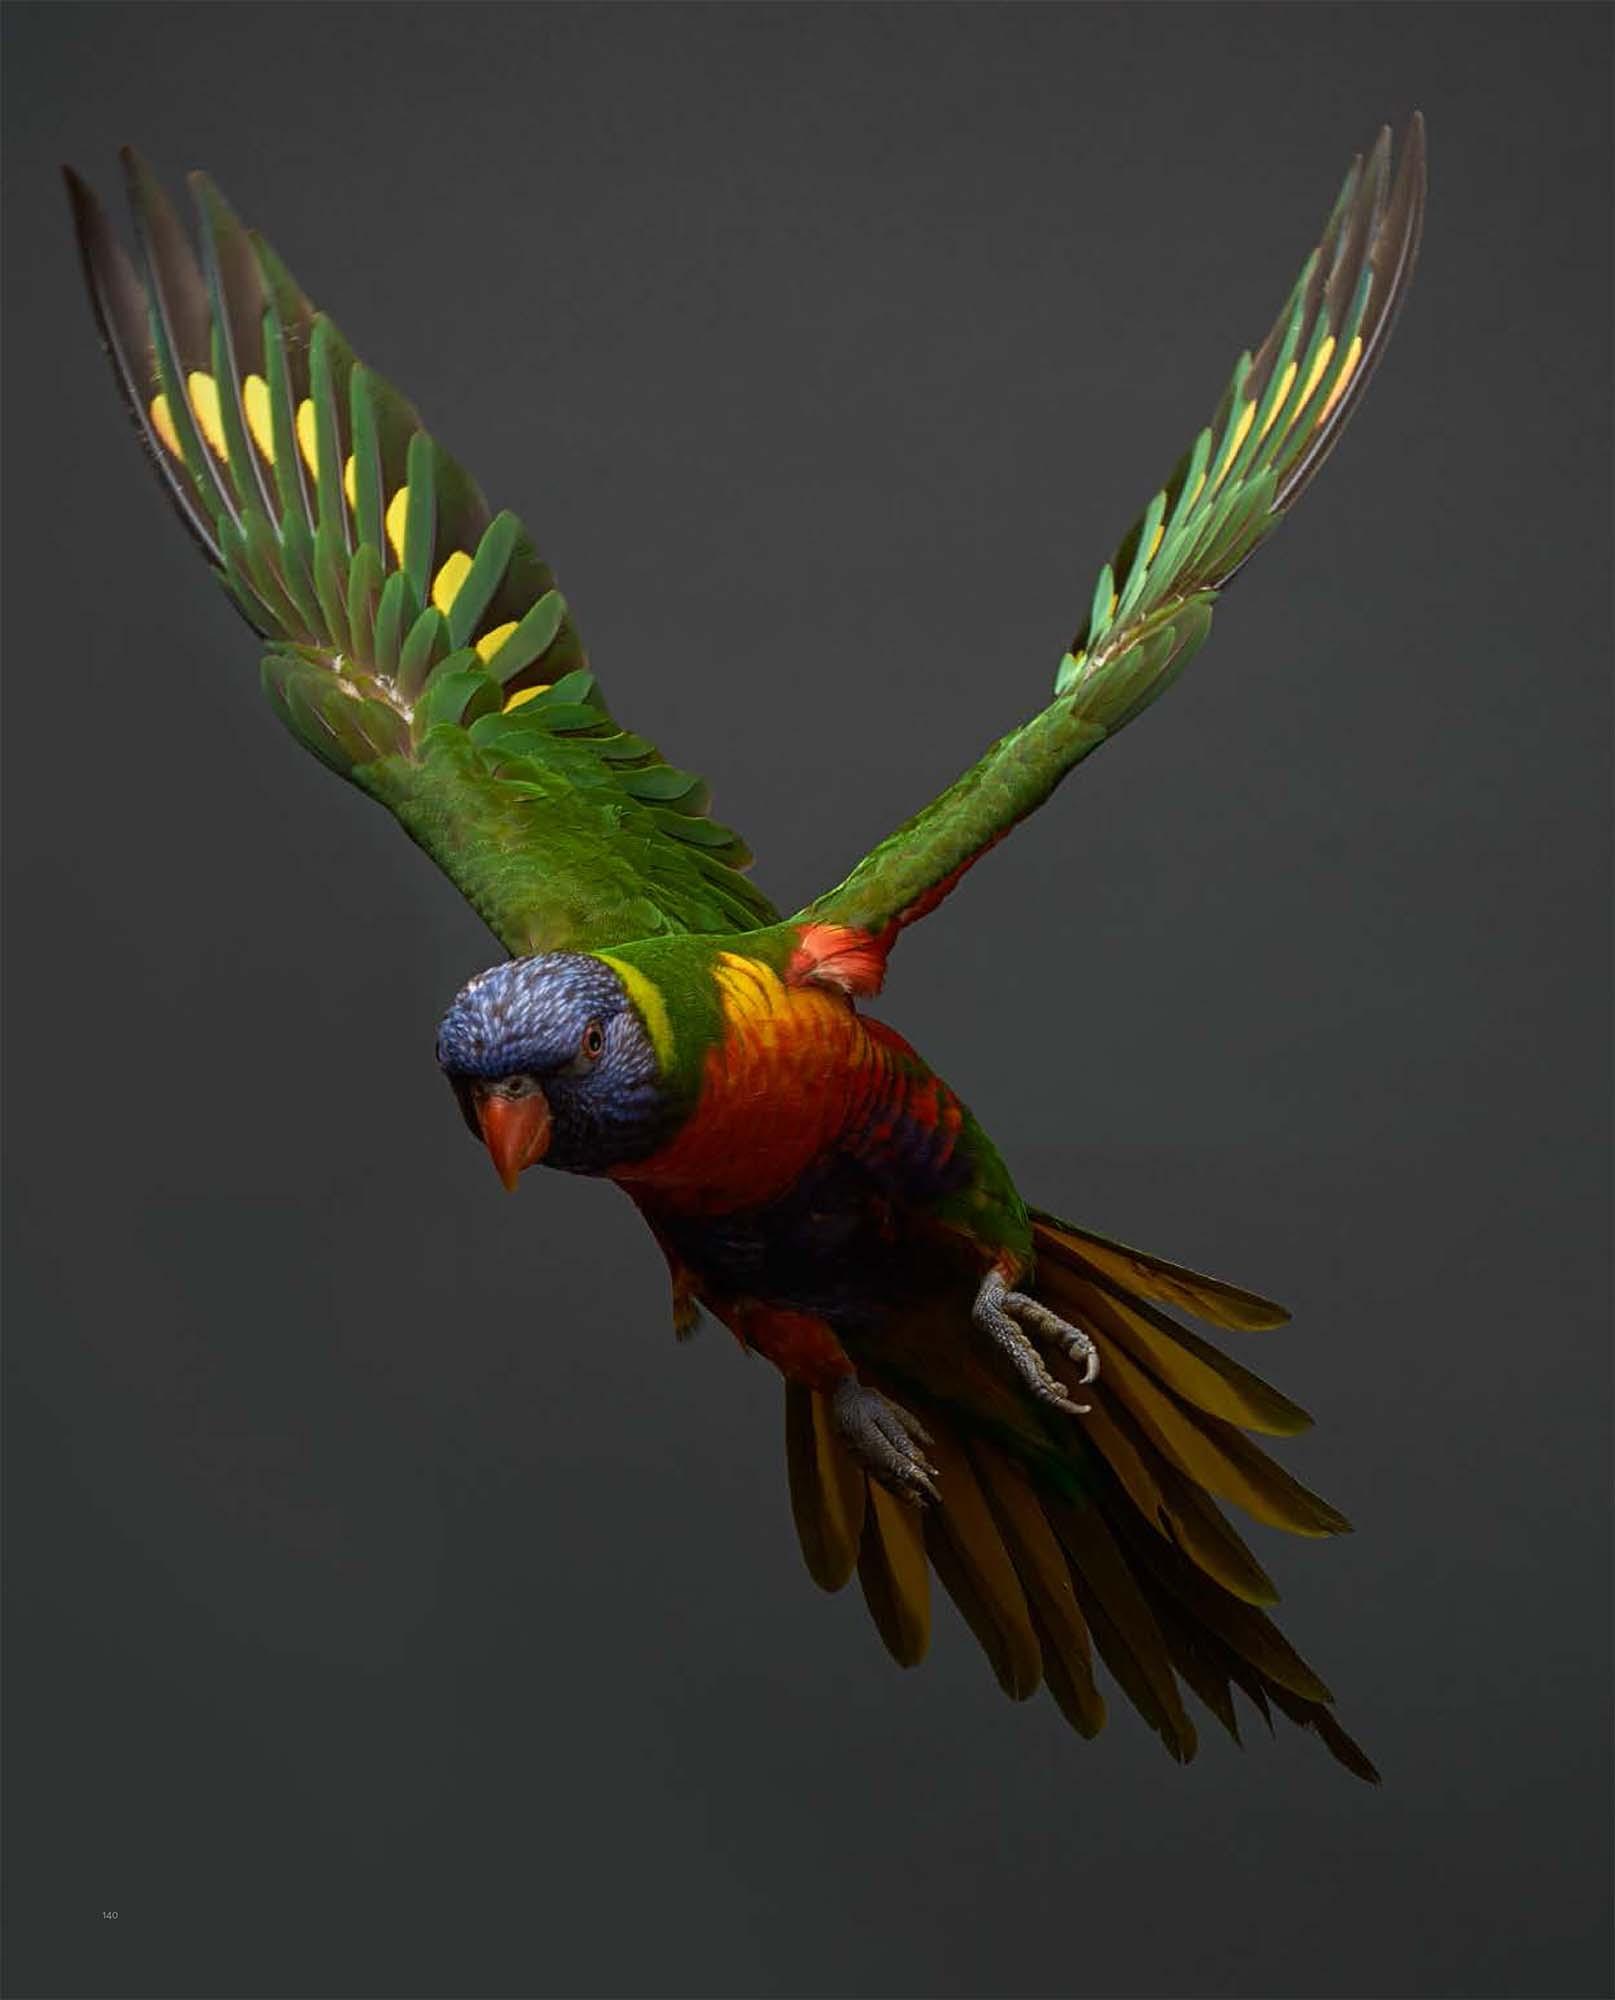 BIRD Gary Heery Book-completemmockup-142.jpg